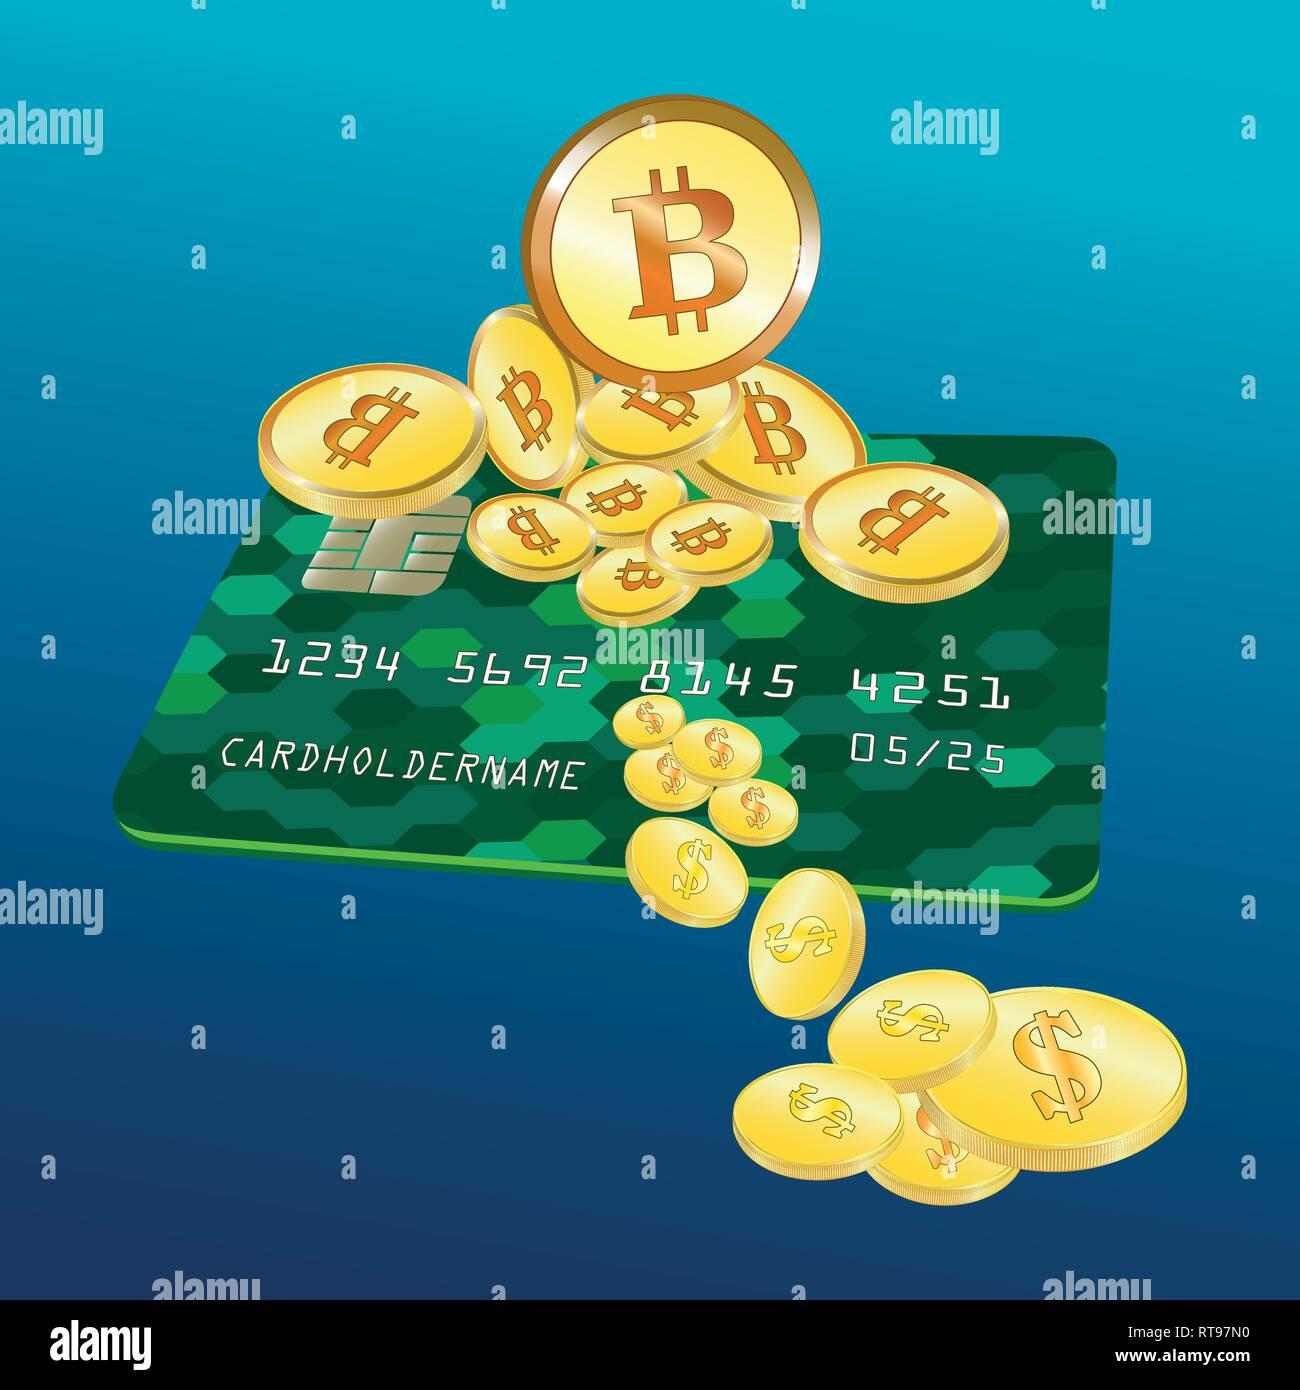 Deep web bitcoins for dummies borgata offer online sports betting